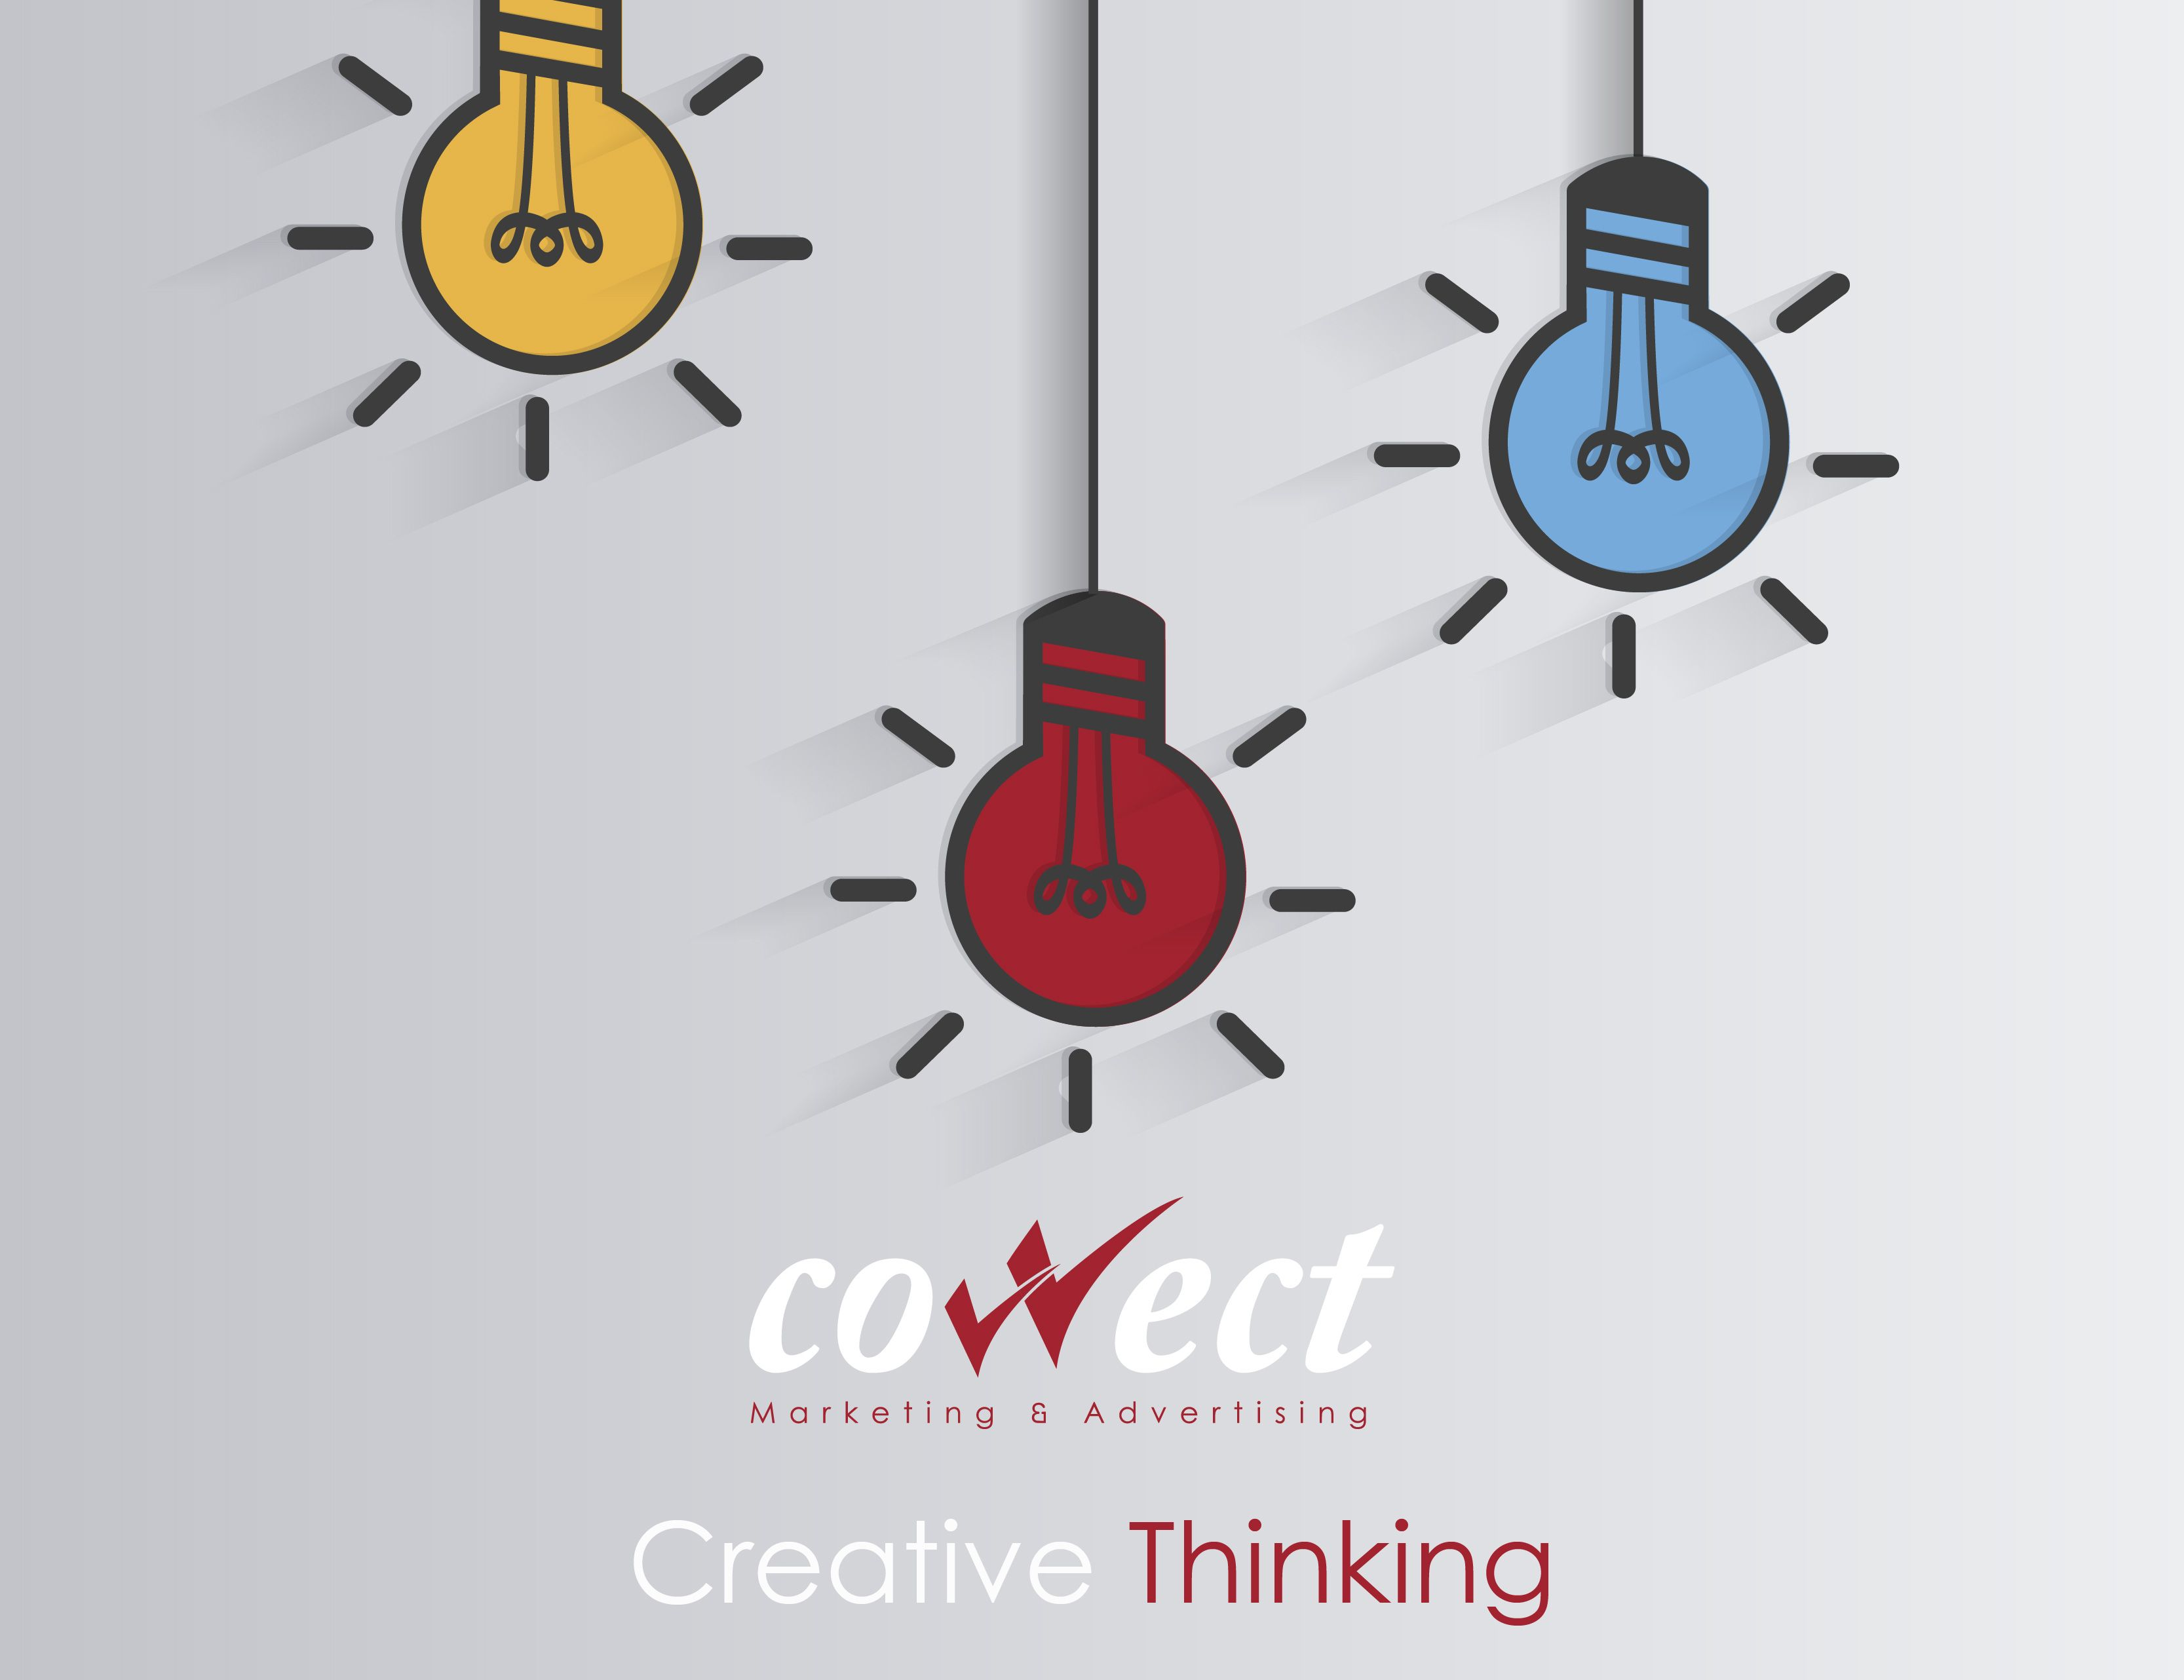 creative thinking with correct marketing Amman dubai